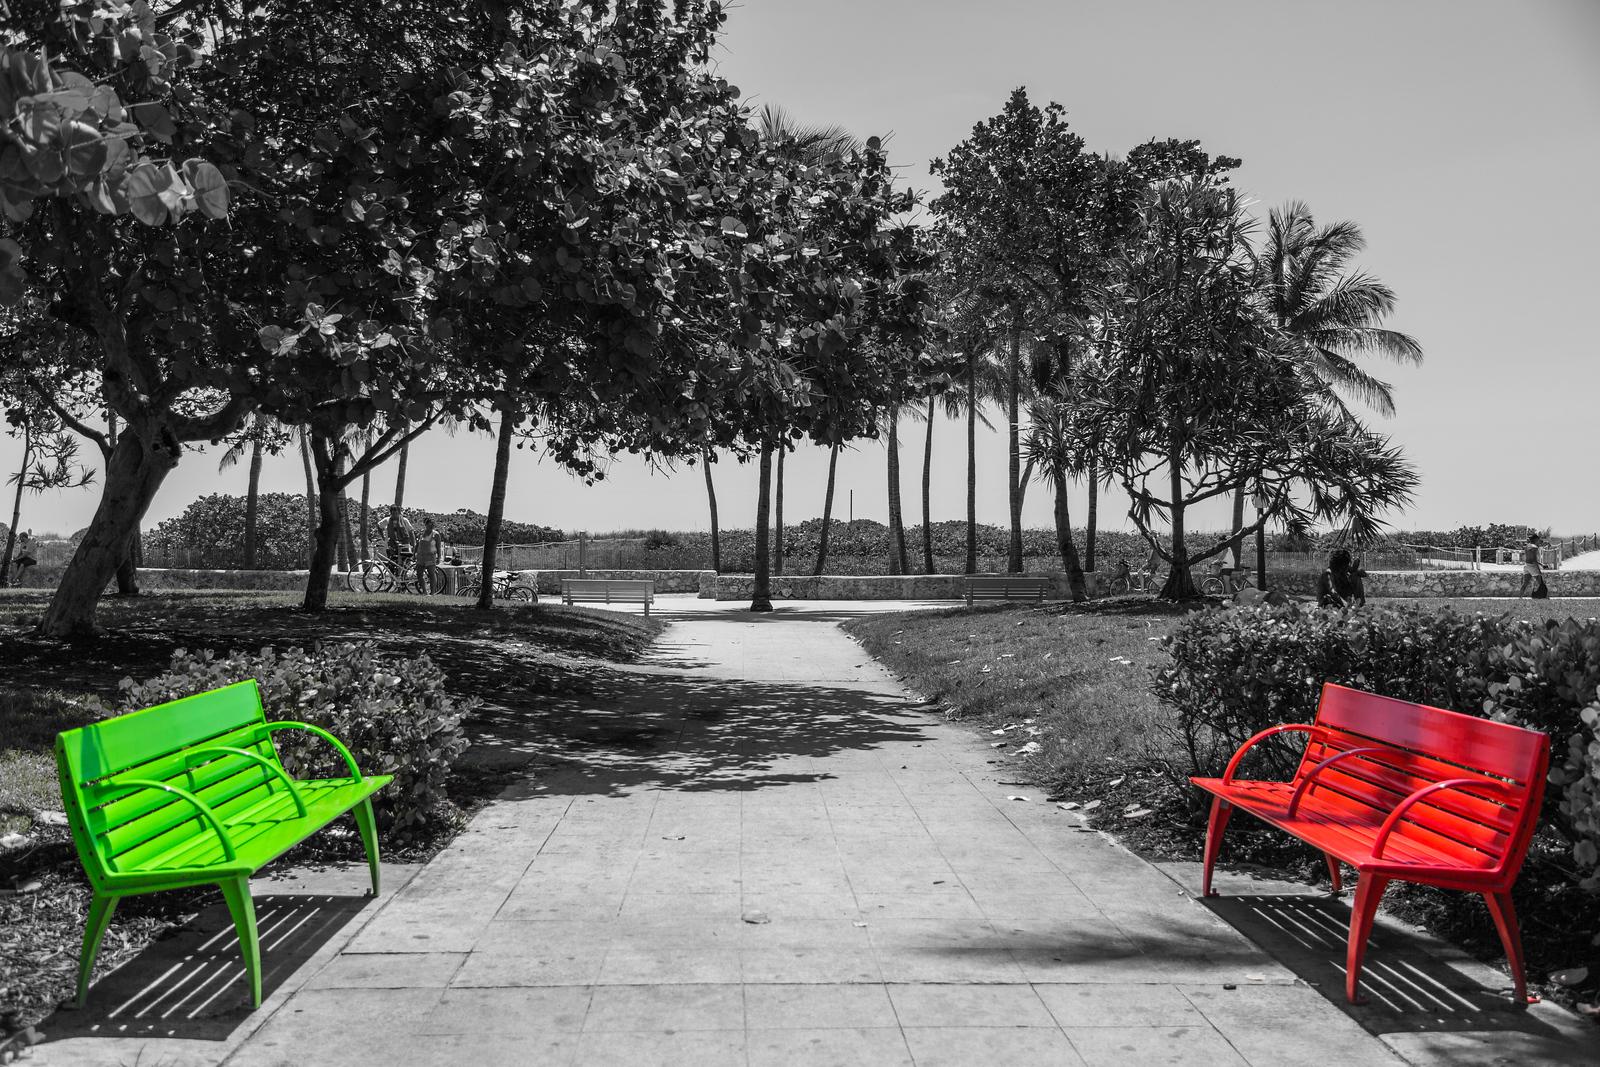 south beach benches